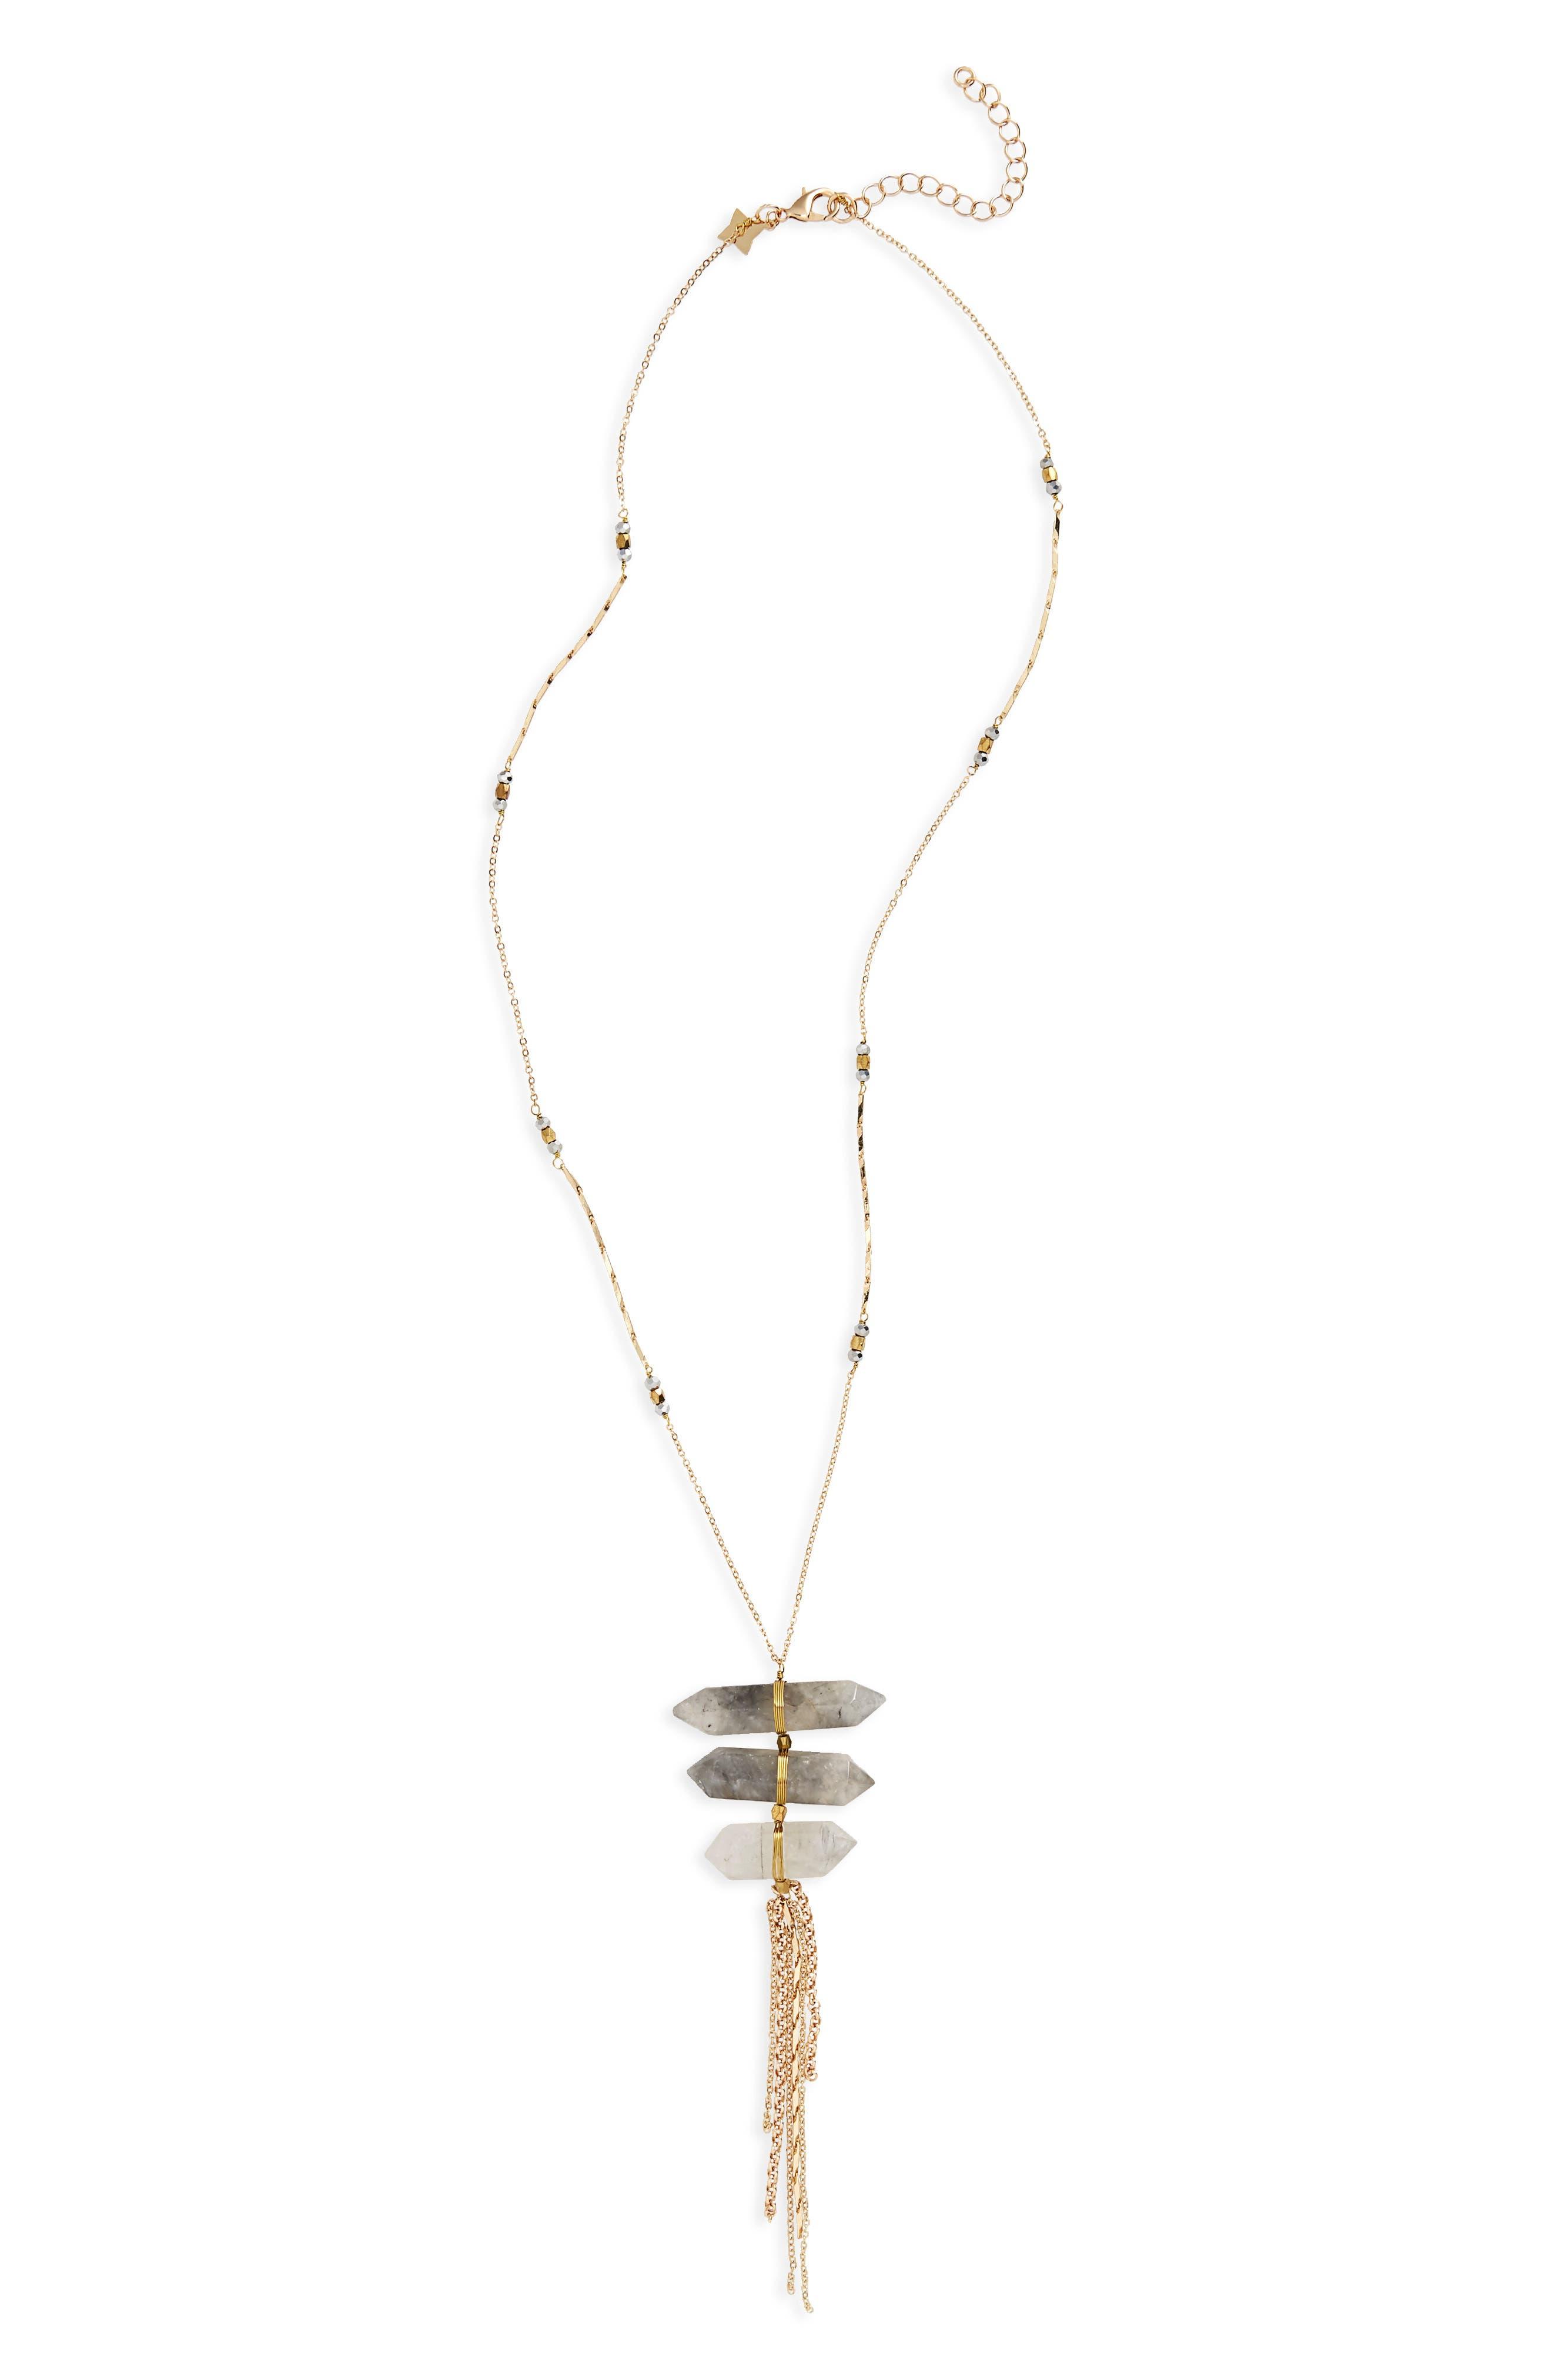 Panacea Tassel Necklace